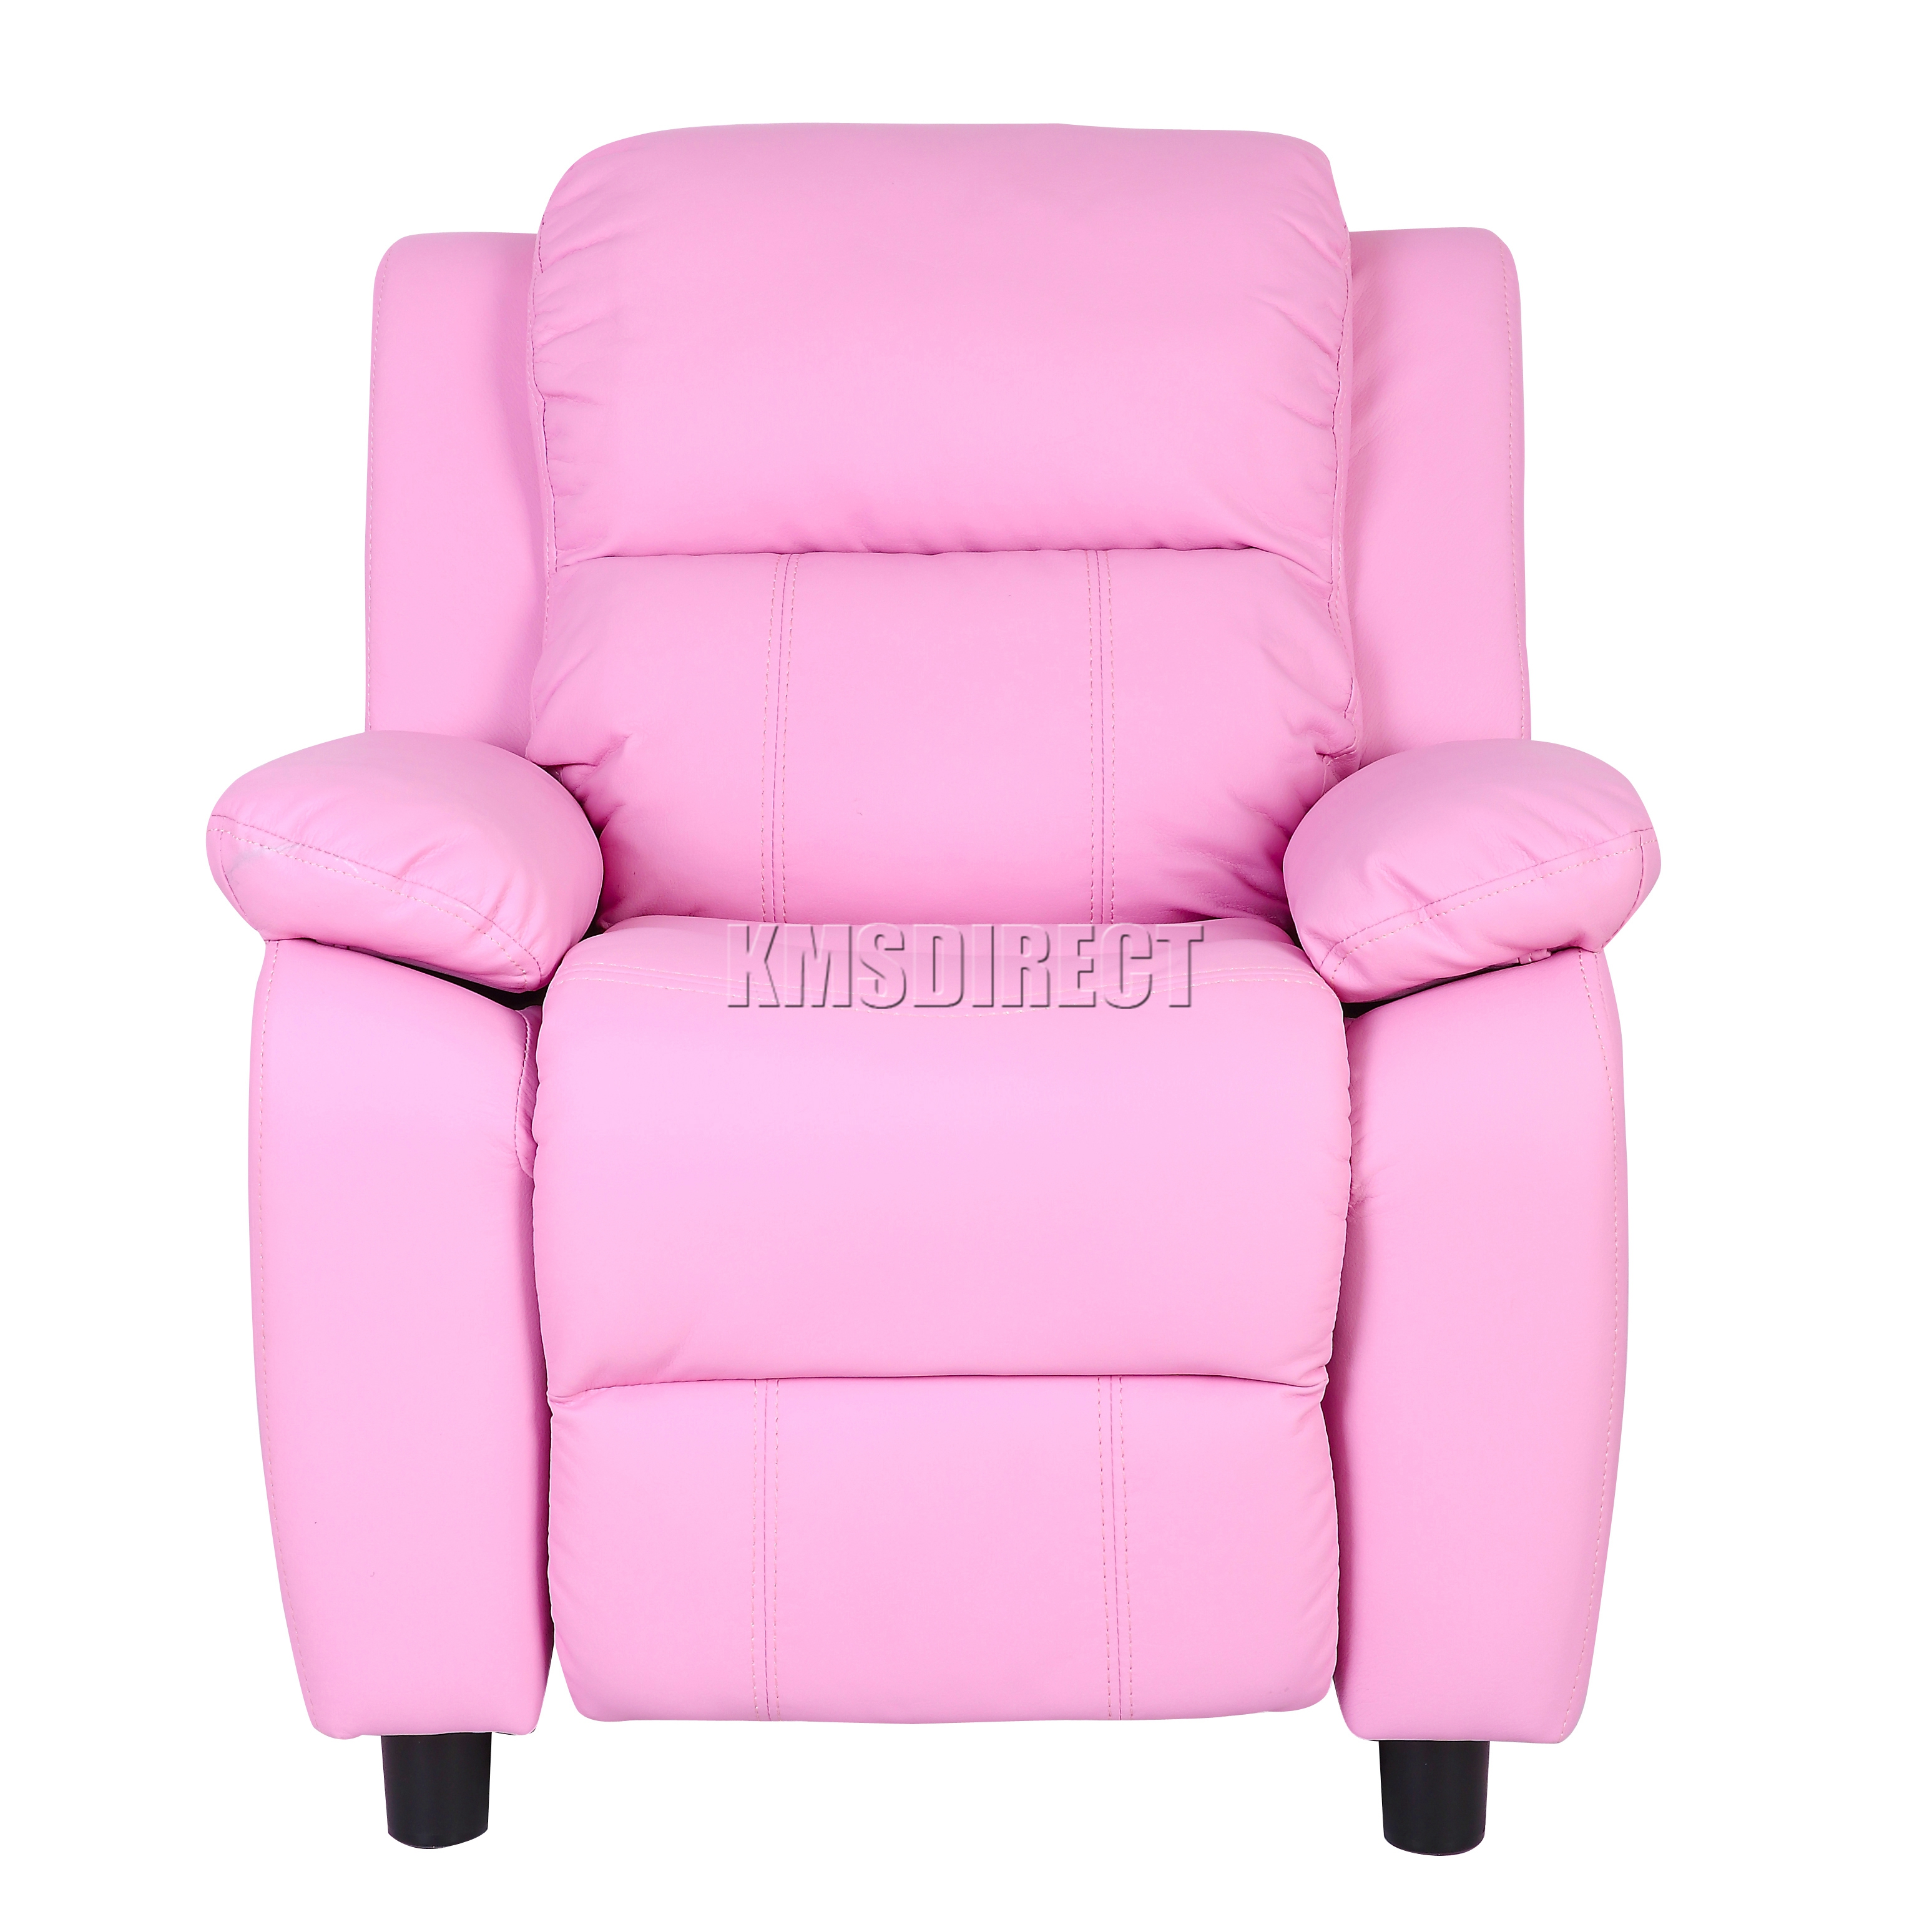 FoxHunter-Kids-Recliner-Armchair-Games-Chair-Sofa-Children-  sc 1 st  eBay & FoxHunter Kids Recliner Armchair Games Chair Sofa Children Seat In ... islam-shia.org